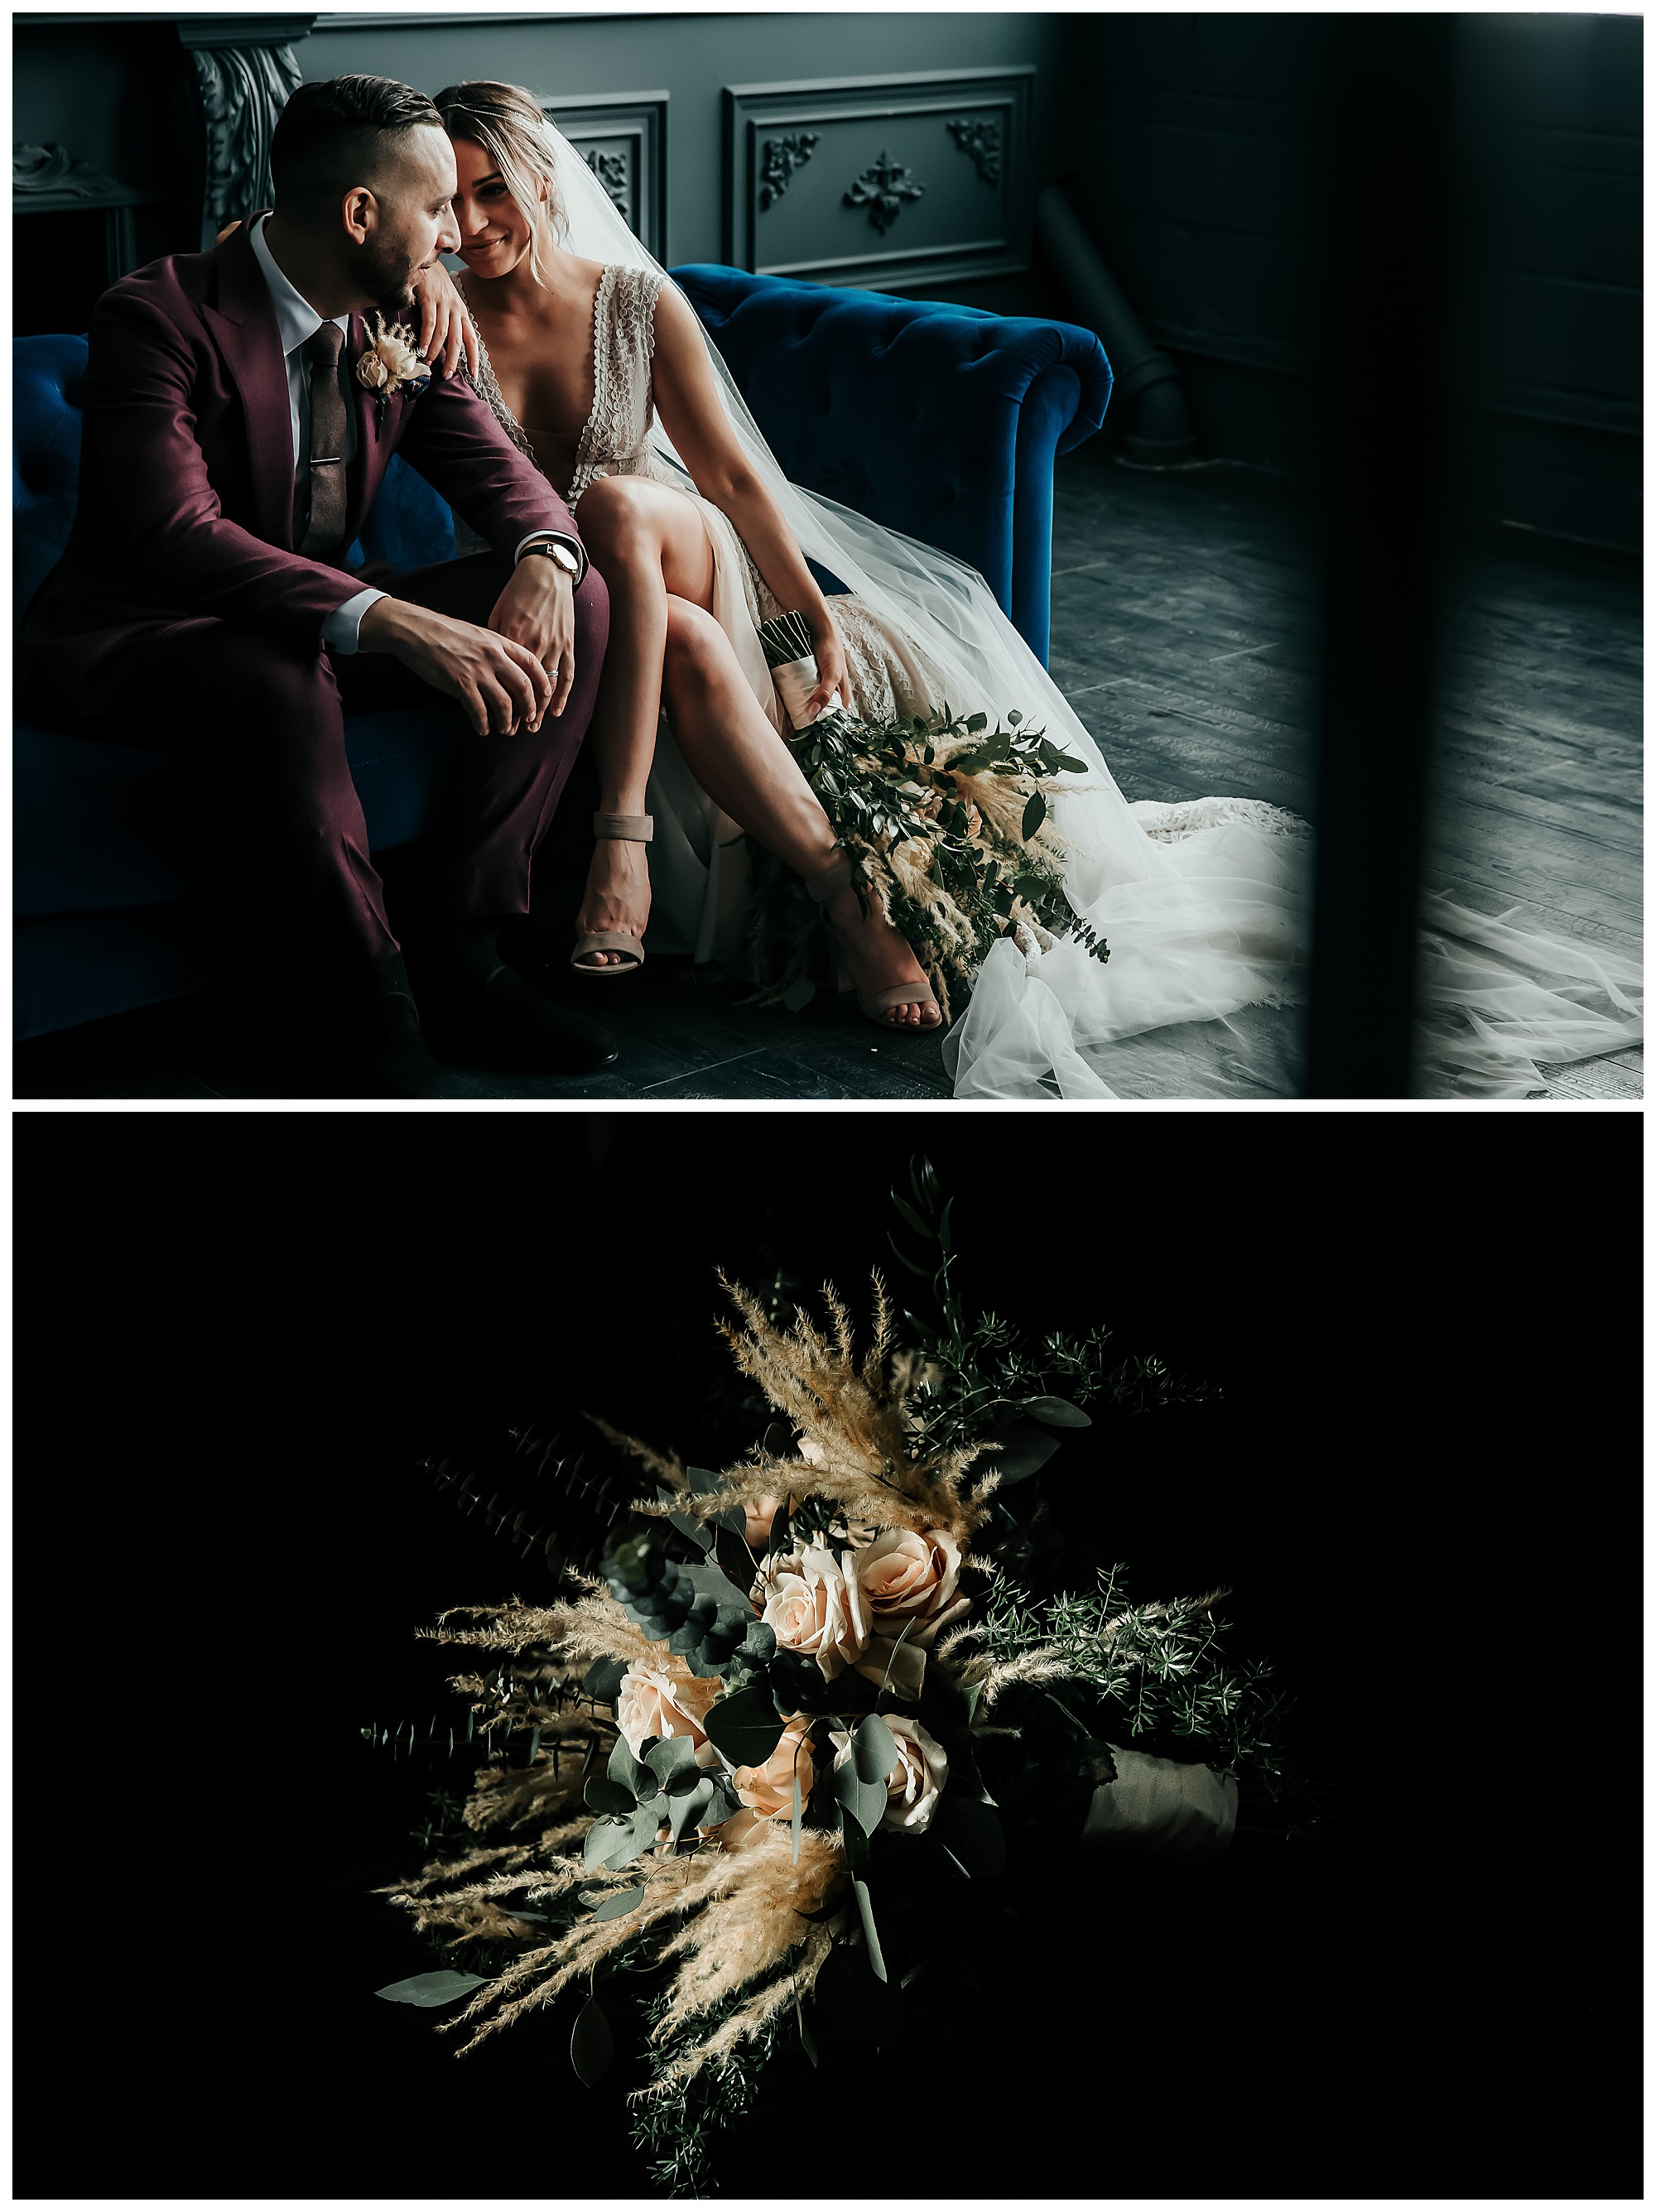 Joanna-Christos-Grand-Luxe-Wedding-Photos-Mint-Room-Toronto-VanDaele-Russell_0092.jpg